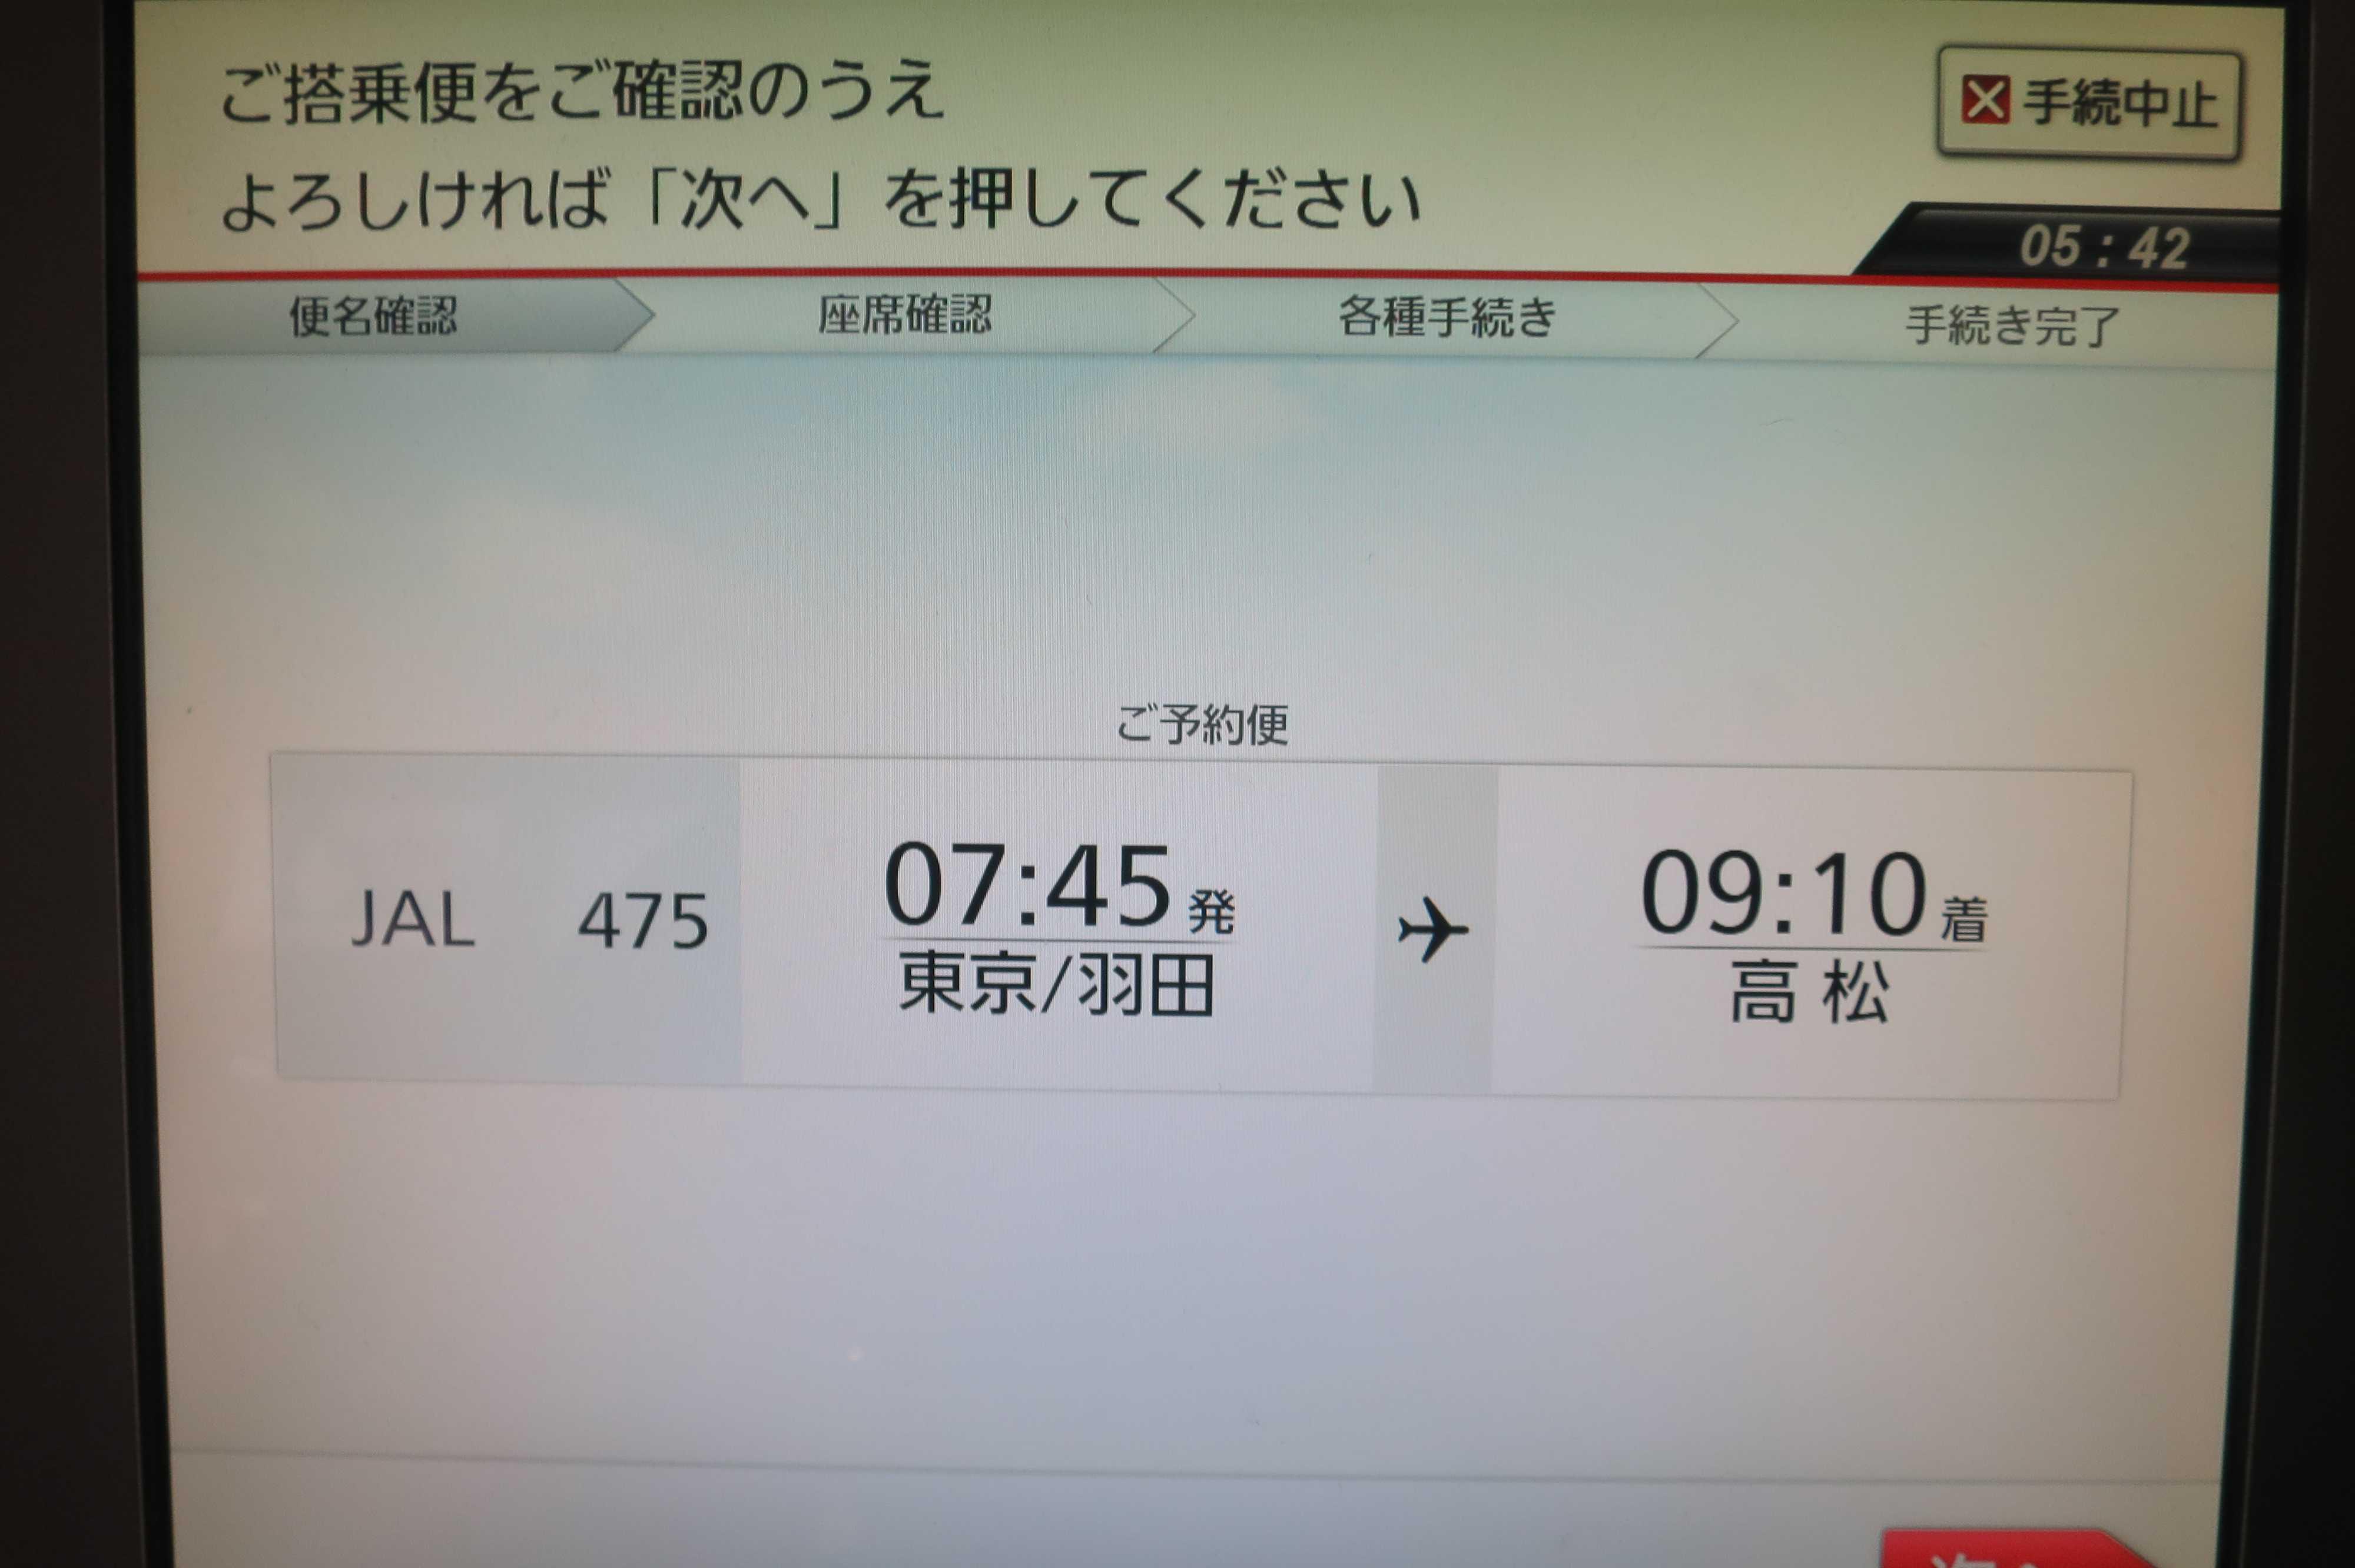 JAL475便 7:45羽田発 - 9:10高松着